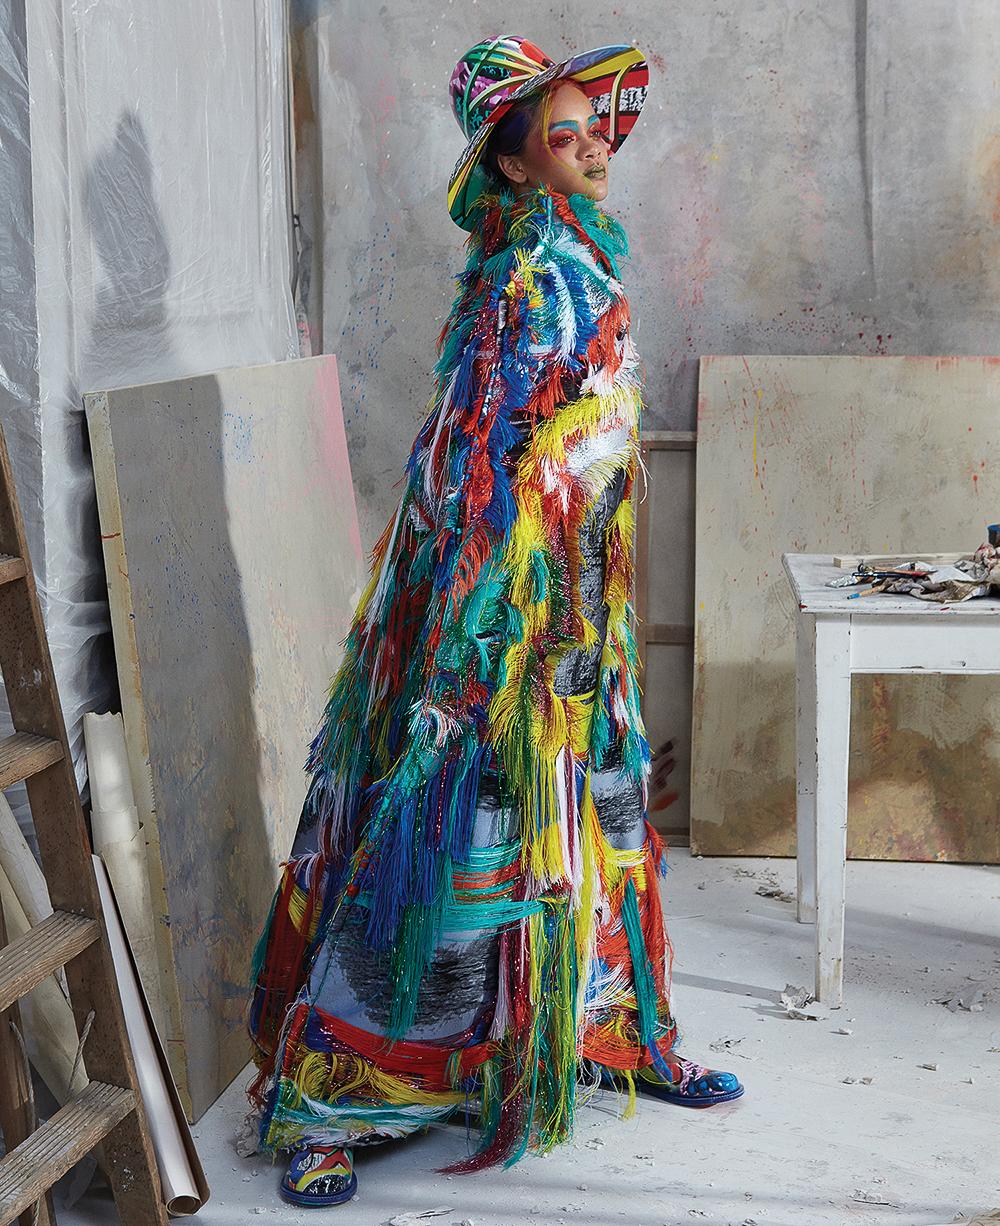 Harpers-Bazaar-Rihanna-10